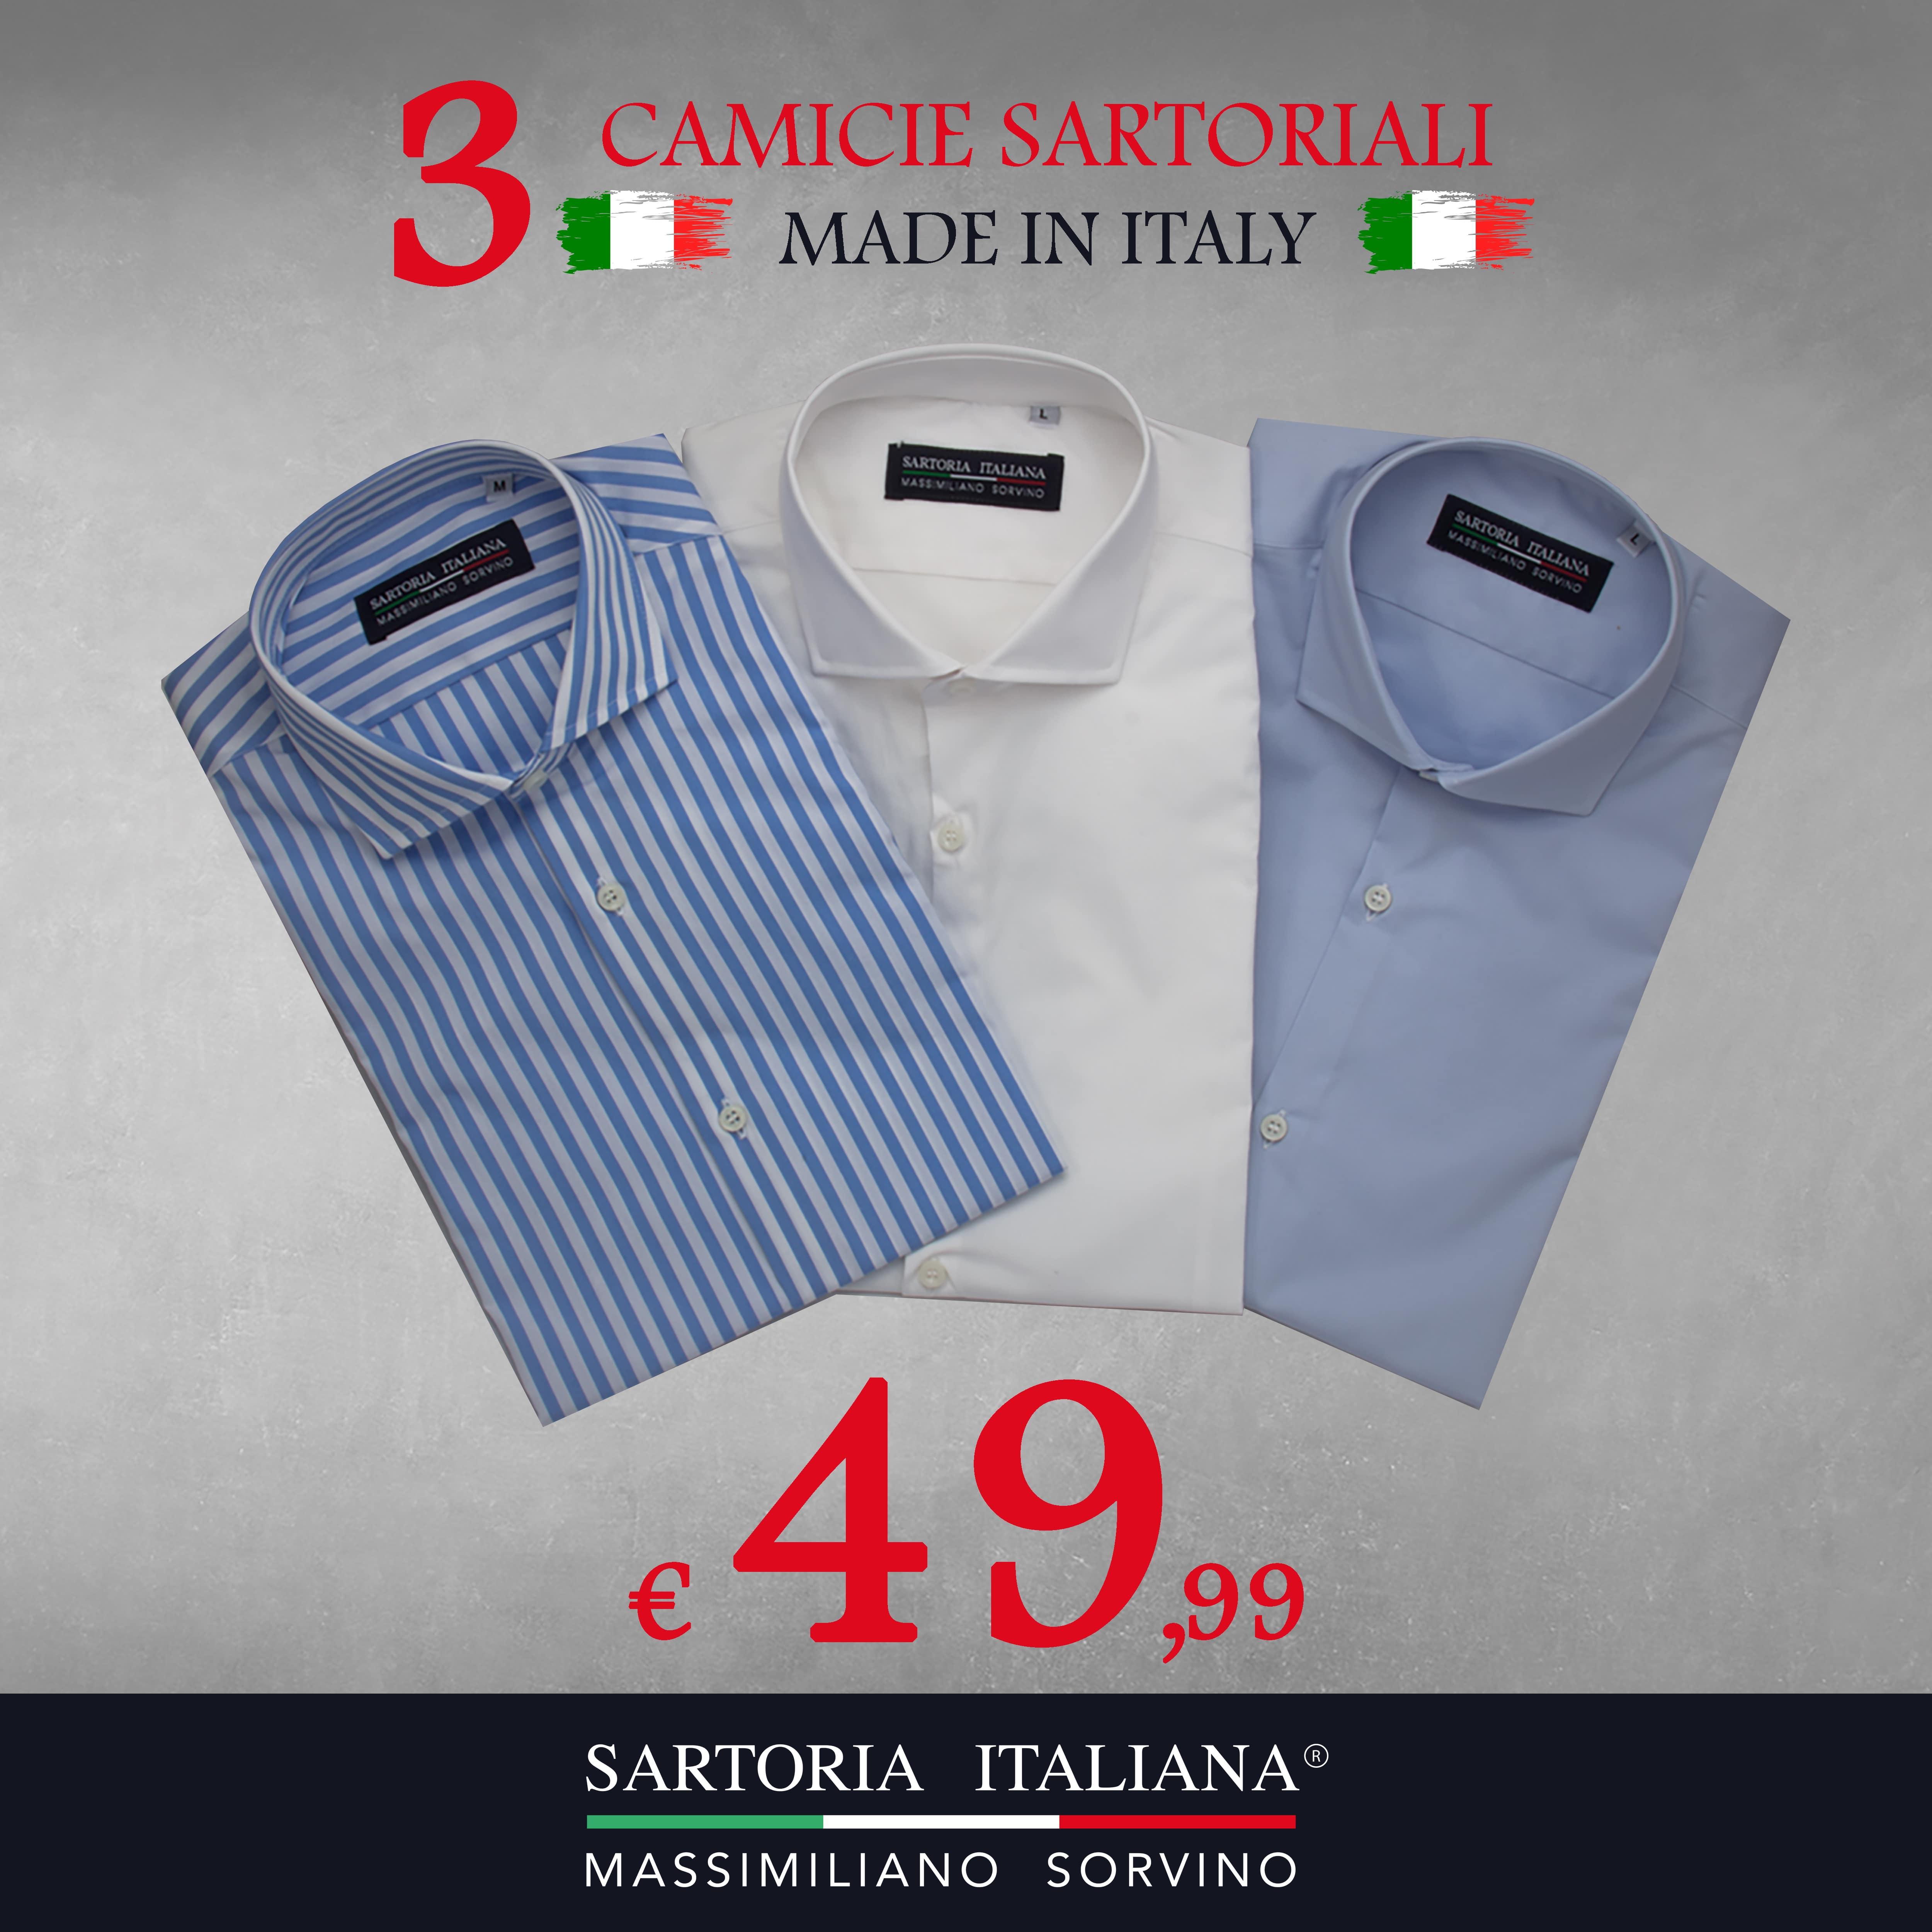 Sartoria Italiana: Camicie